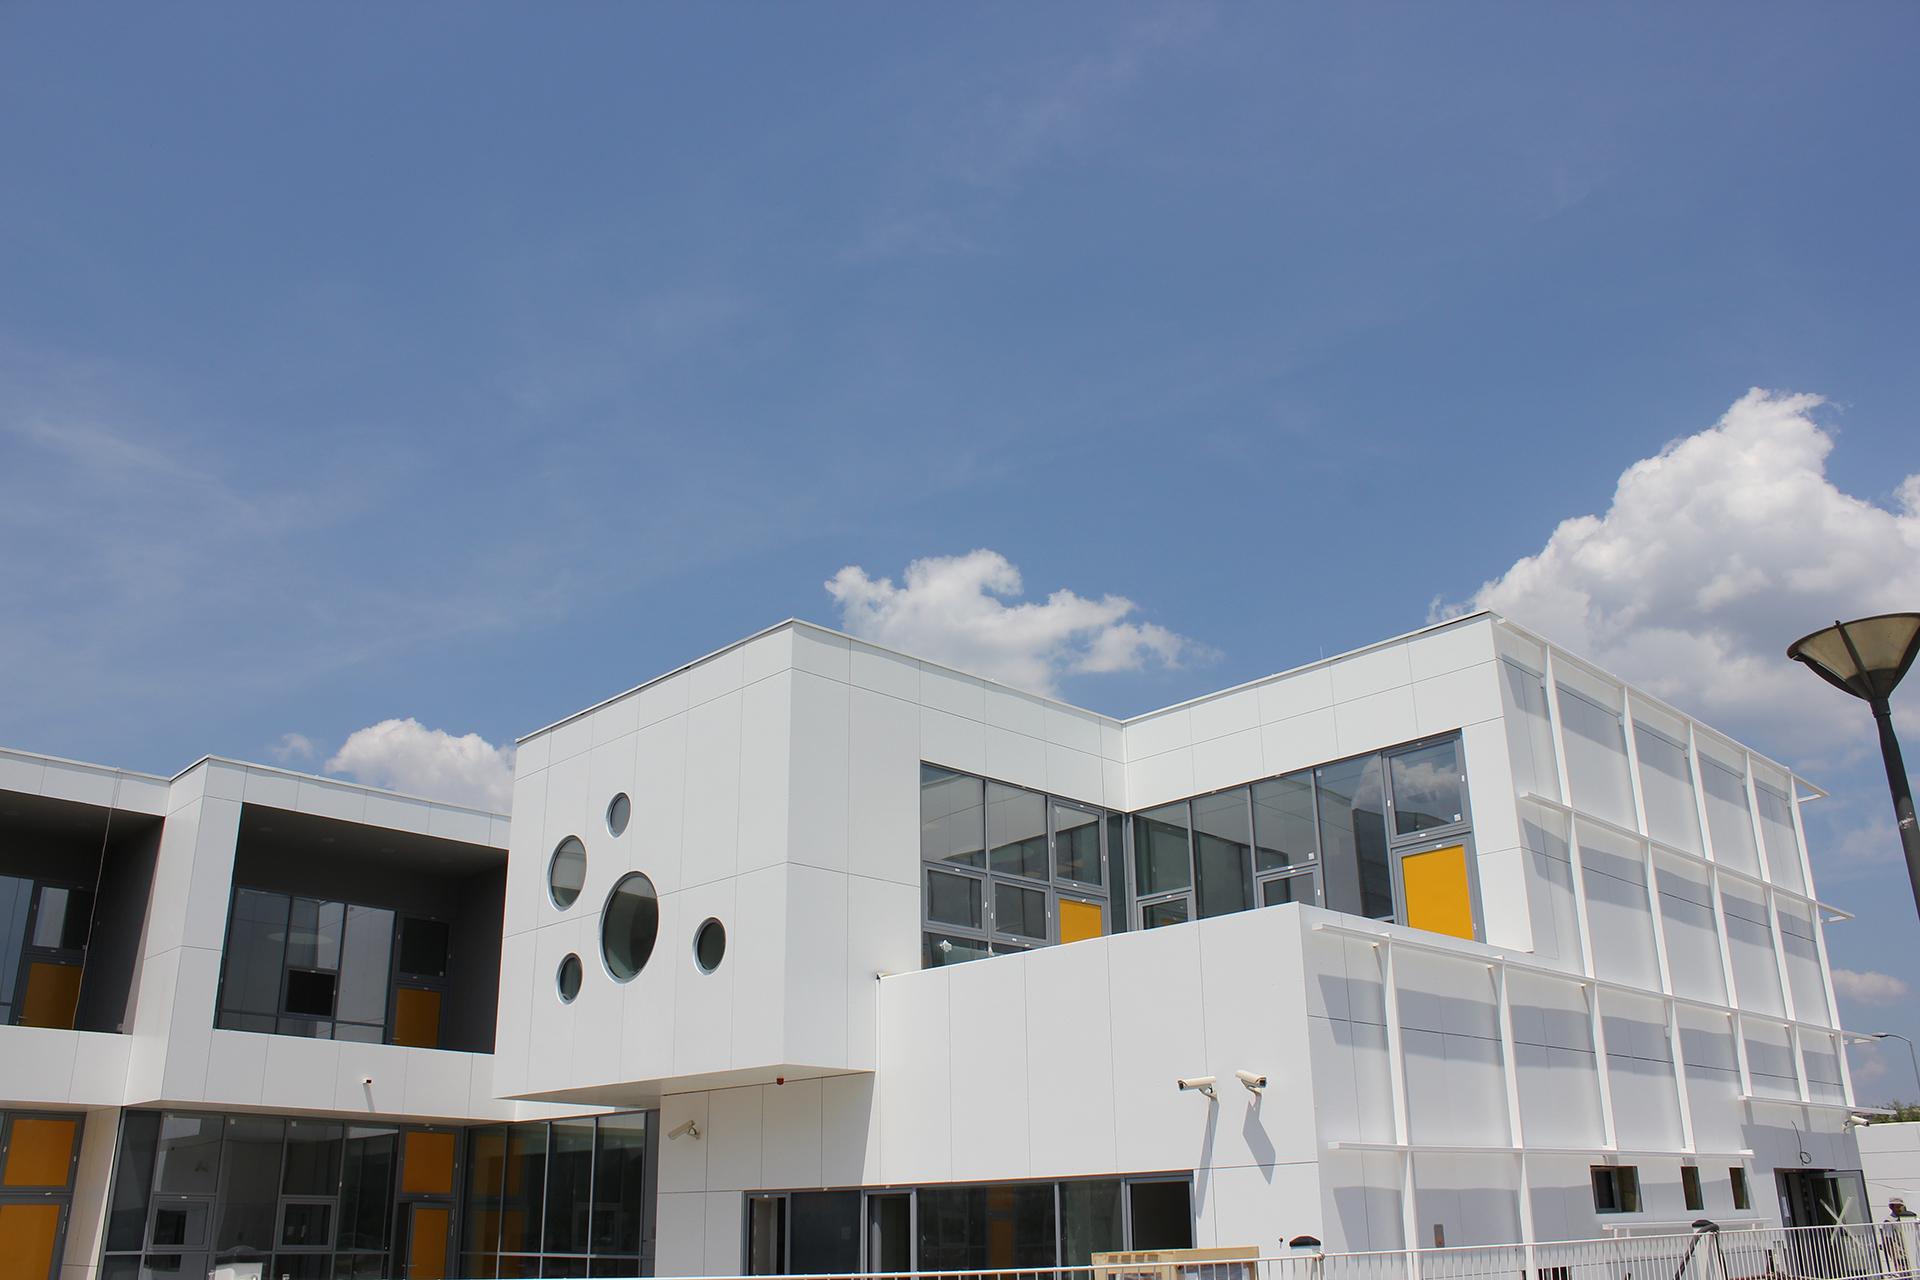 Ventilisane fasade i bravarski radovi